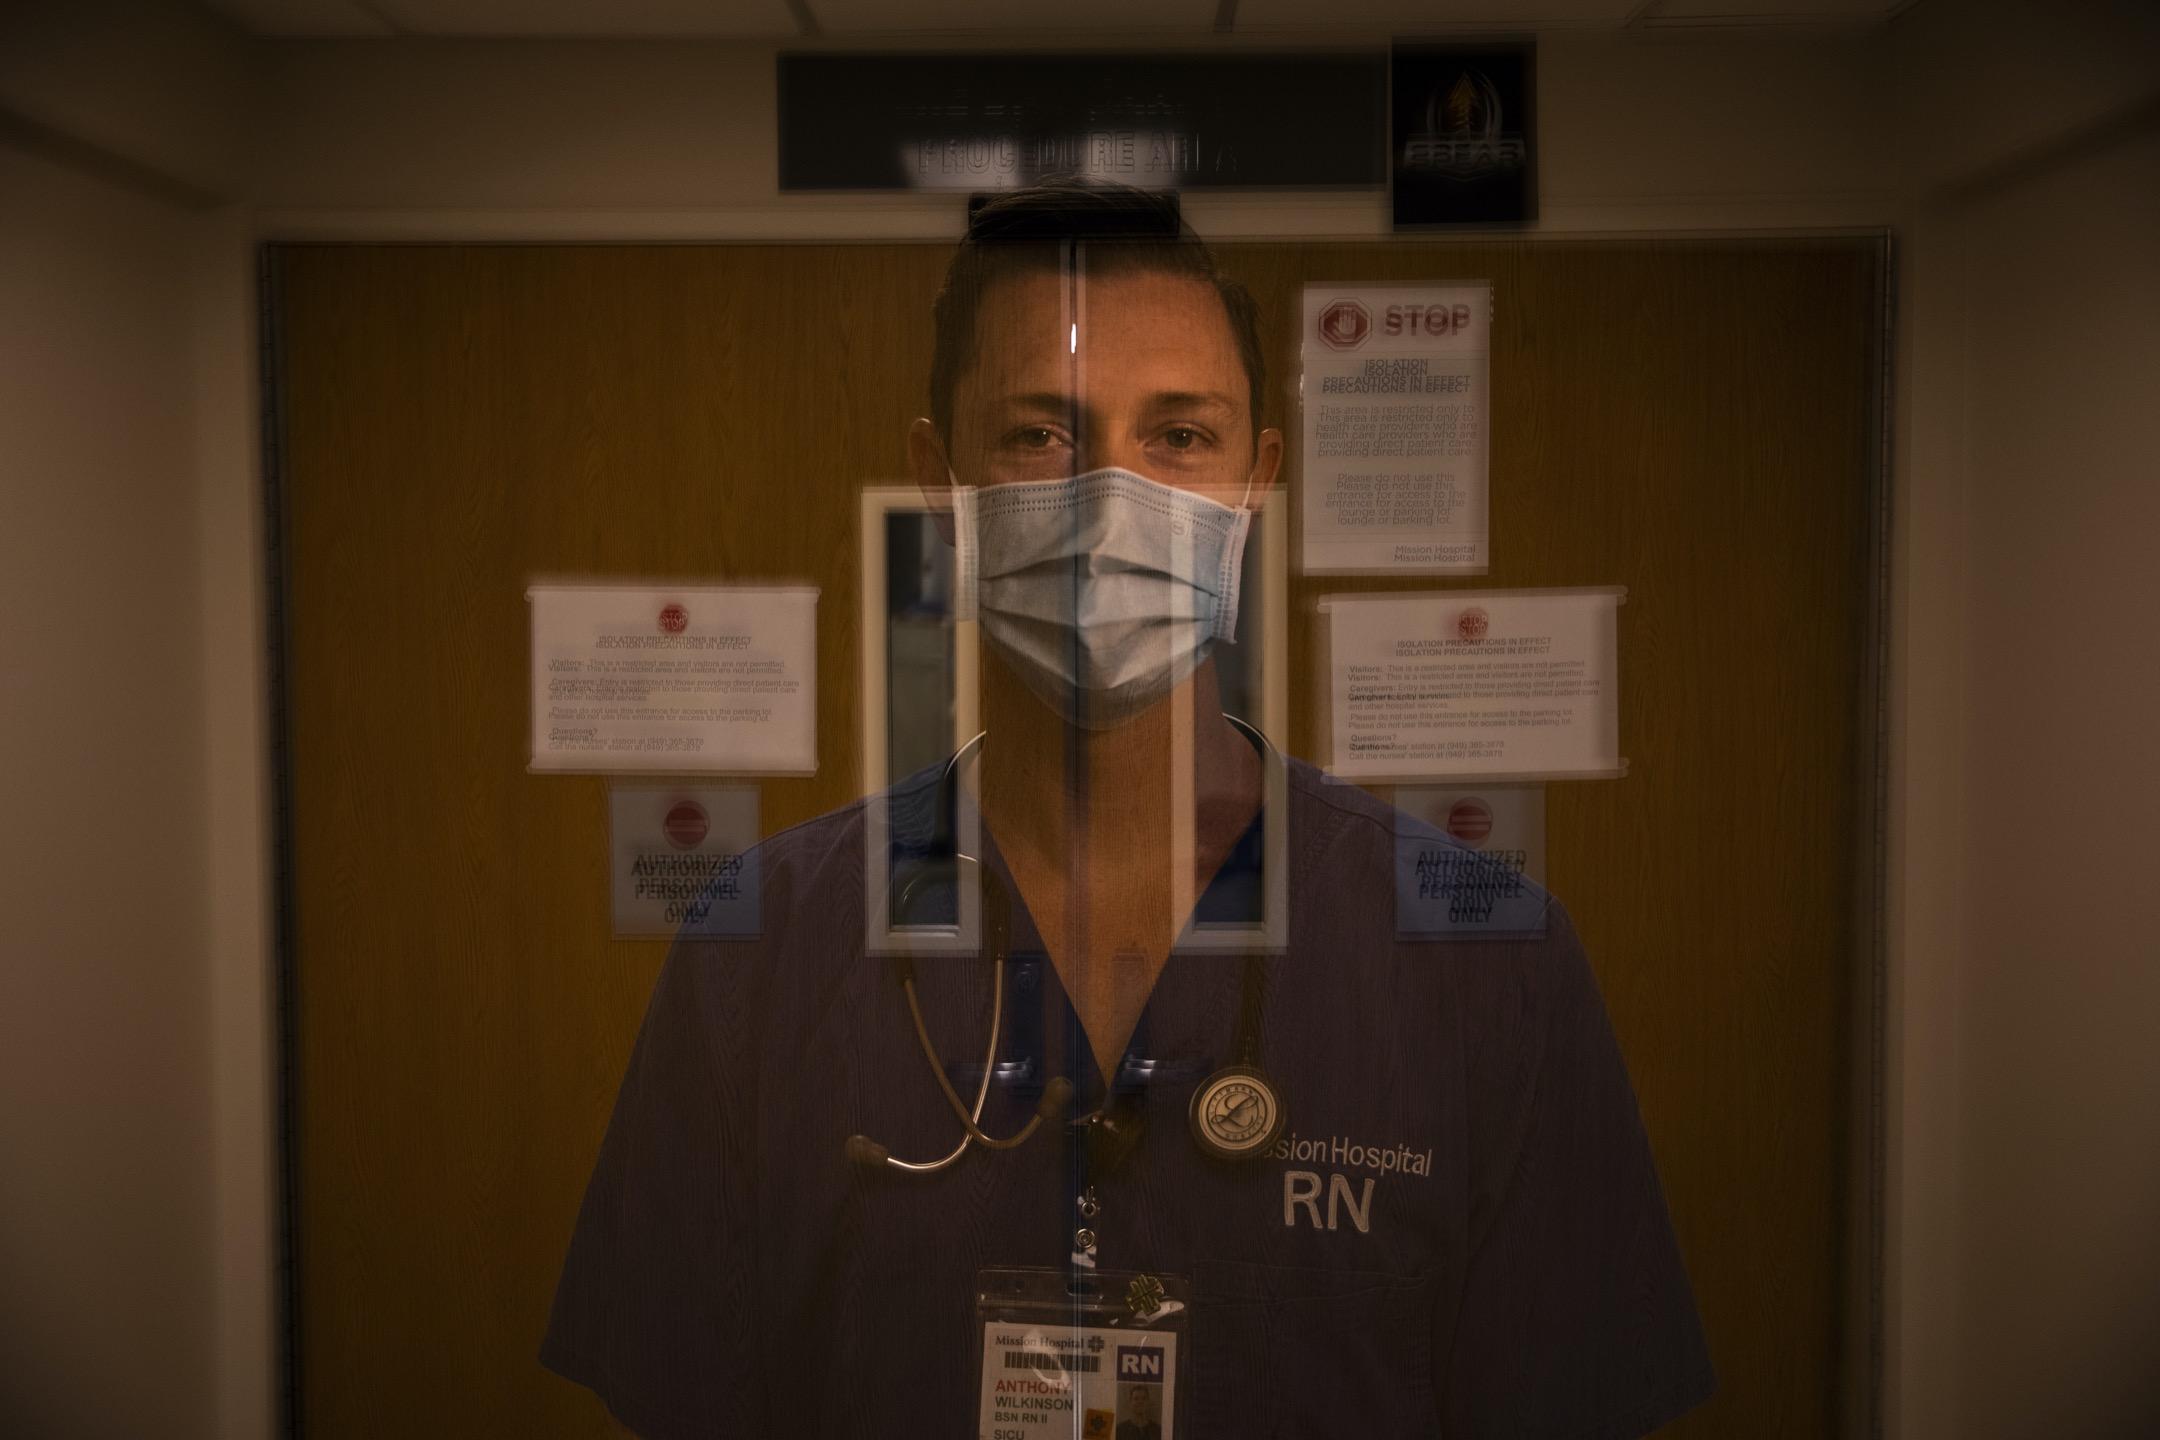 Anthony Wilkinson仍然記得那段30小時的經歷——當天有三位病人過身。「我試圖令他們存活,但他們的身體卻正在腐壞。」 攝:Jae C. Hong/AP/達志影像